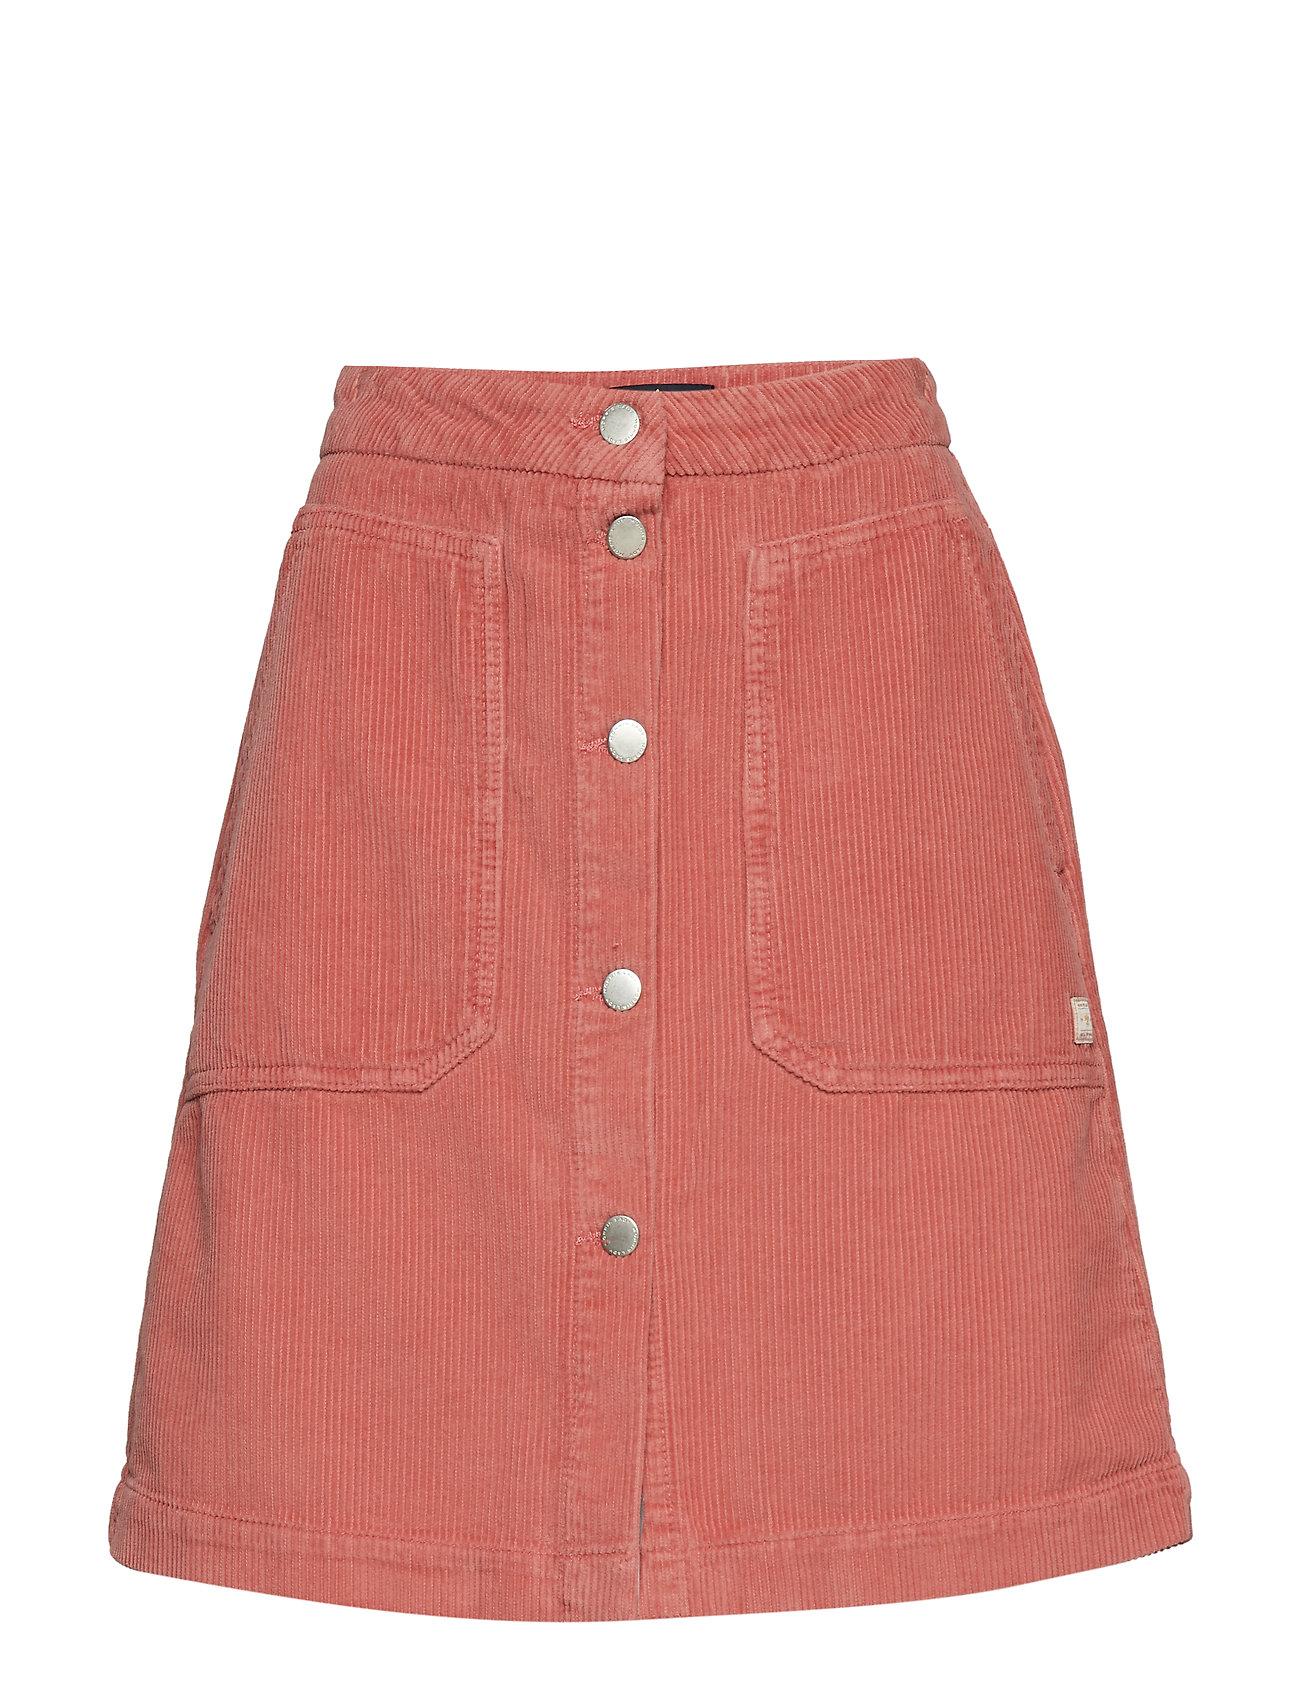 Morris Lady Alba Skirt - PINK